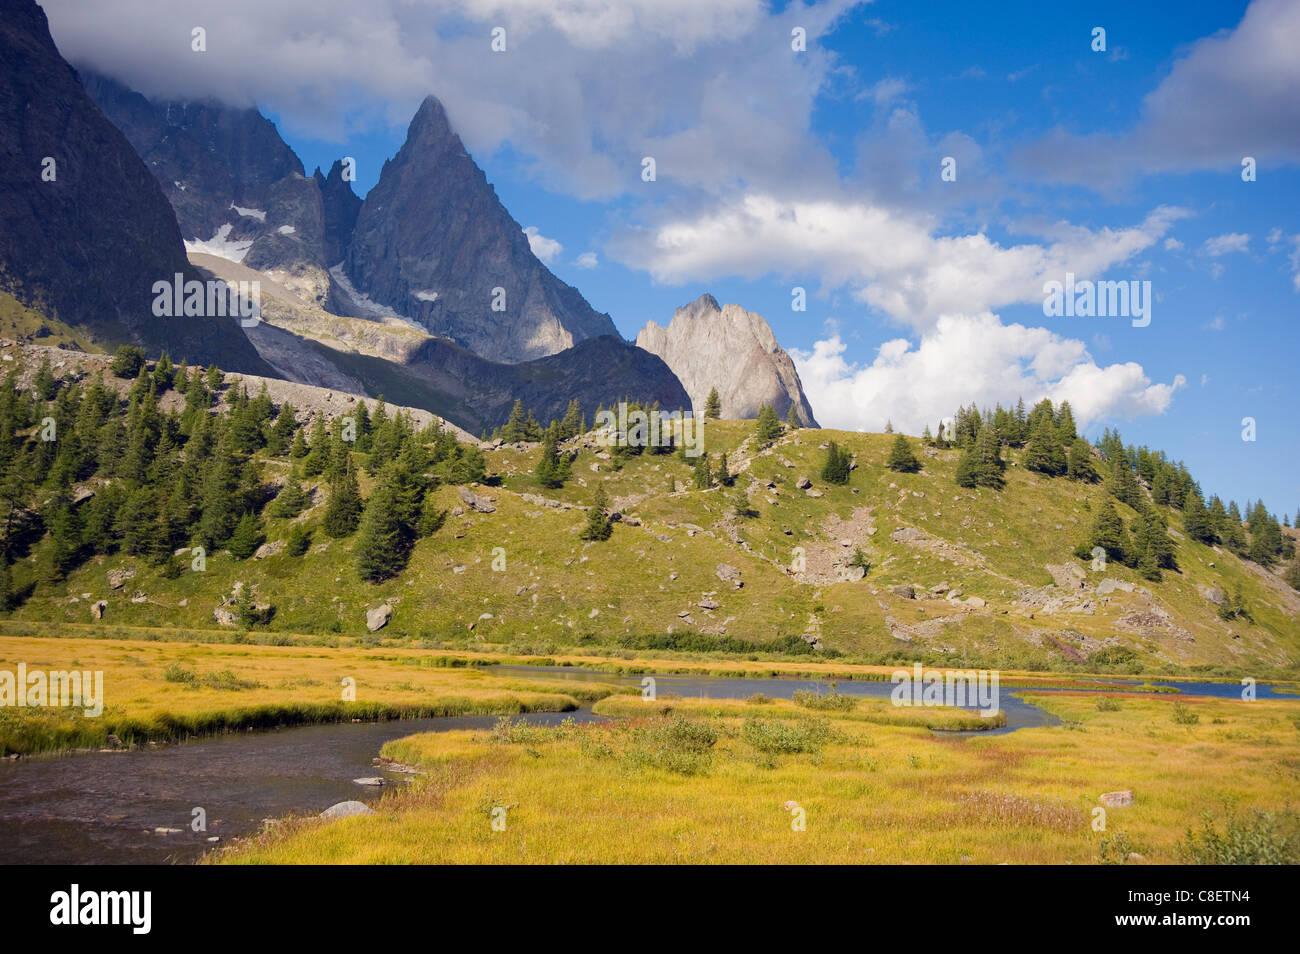 Trekking route, Tour de Mont Blanc, Val Veny, near Courmayeur, Italy - Stock Image